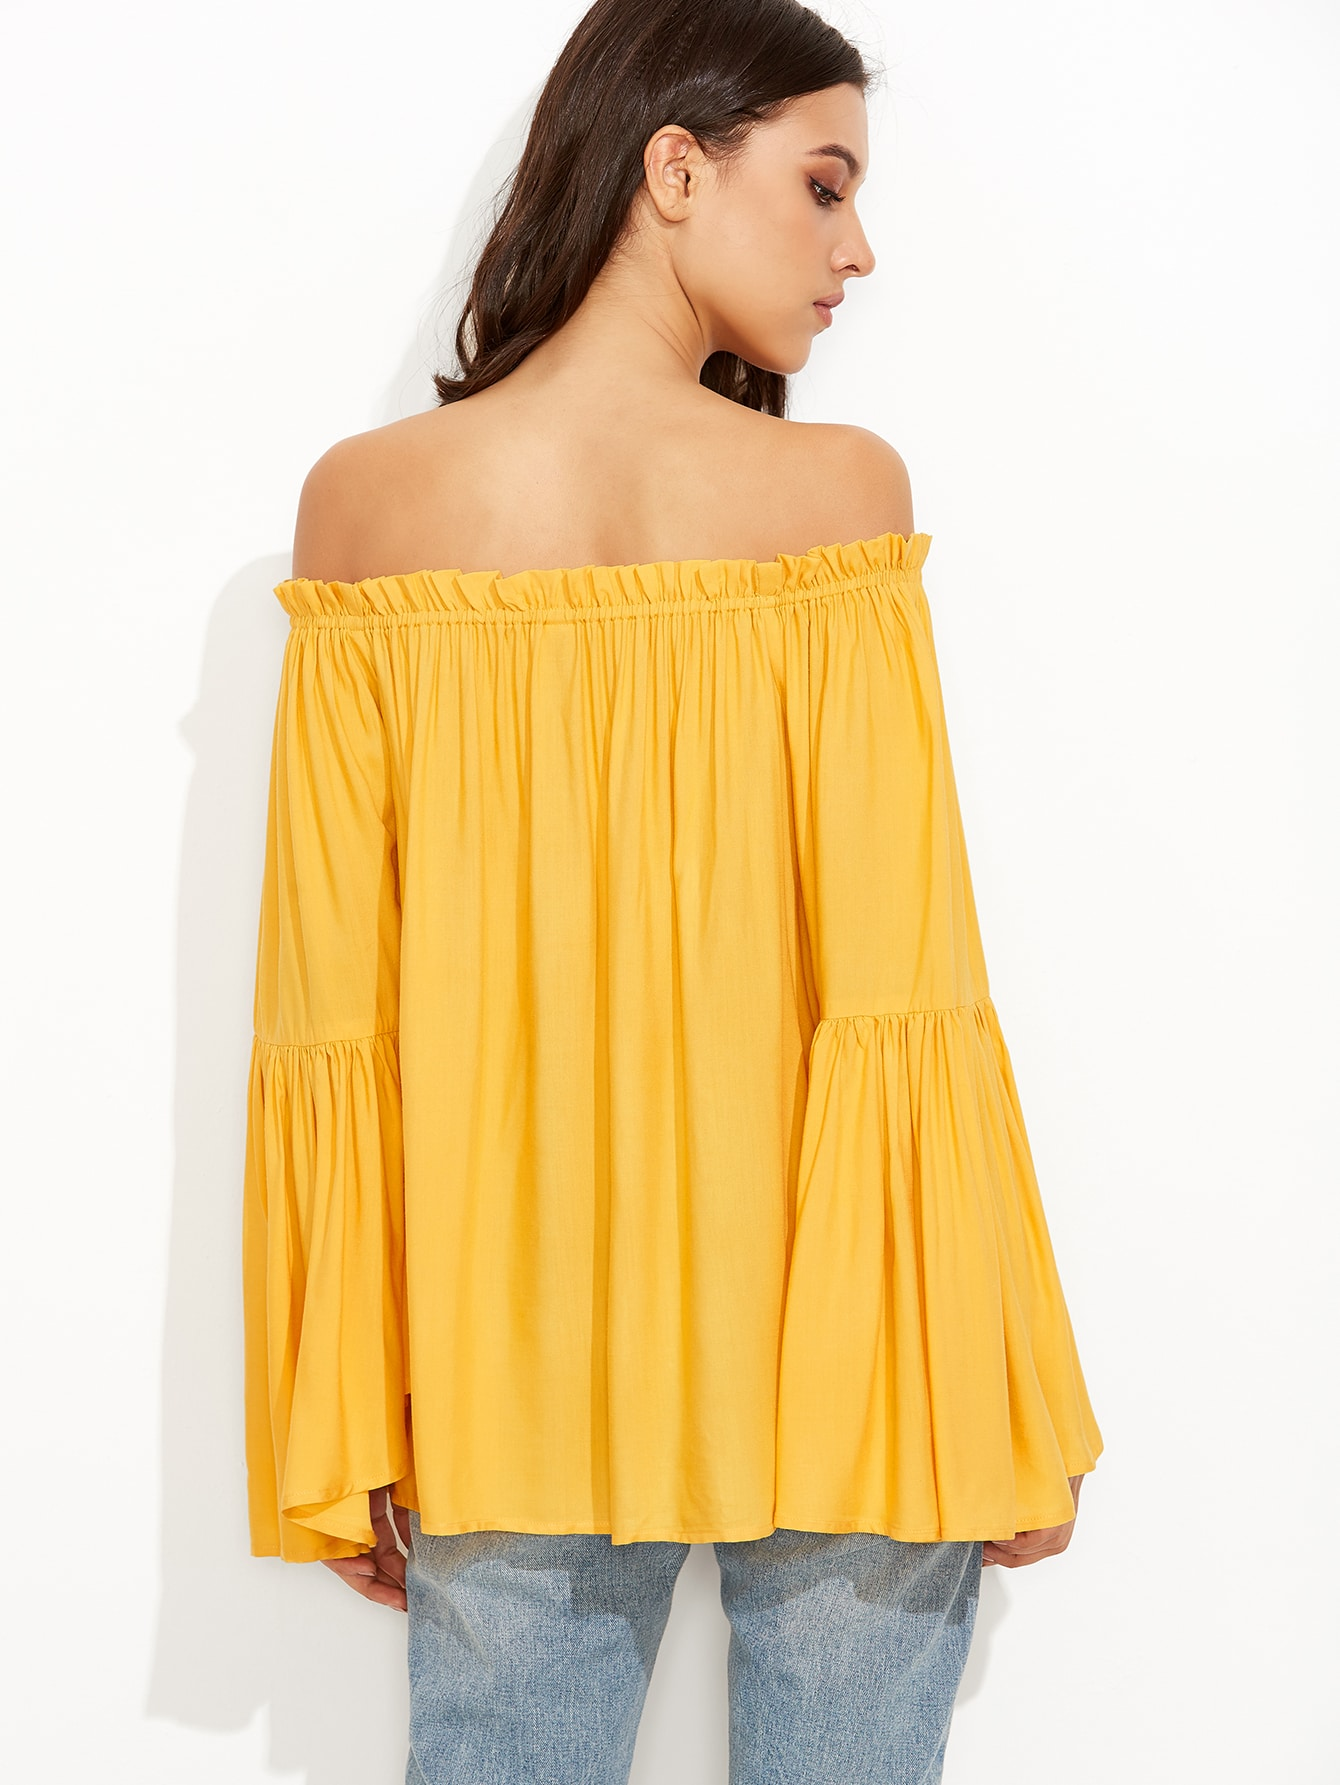 blouse160818704_2